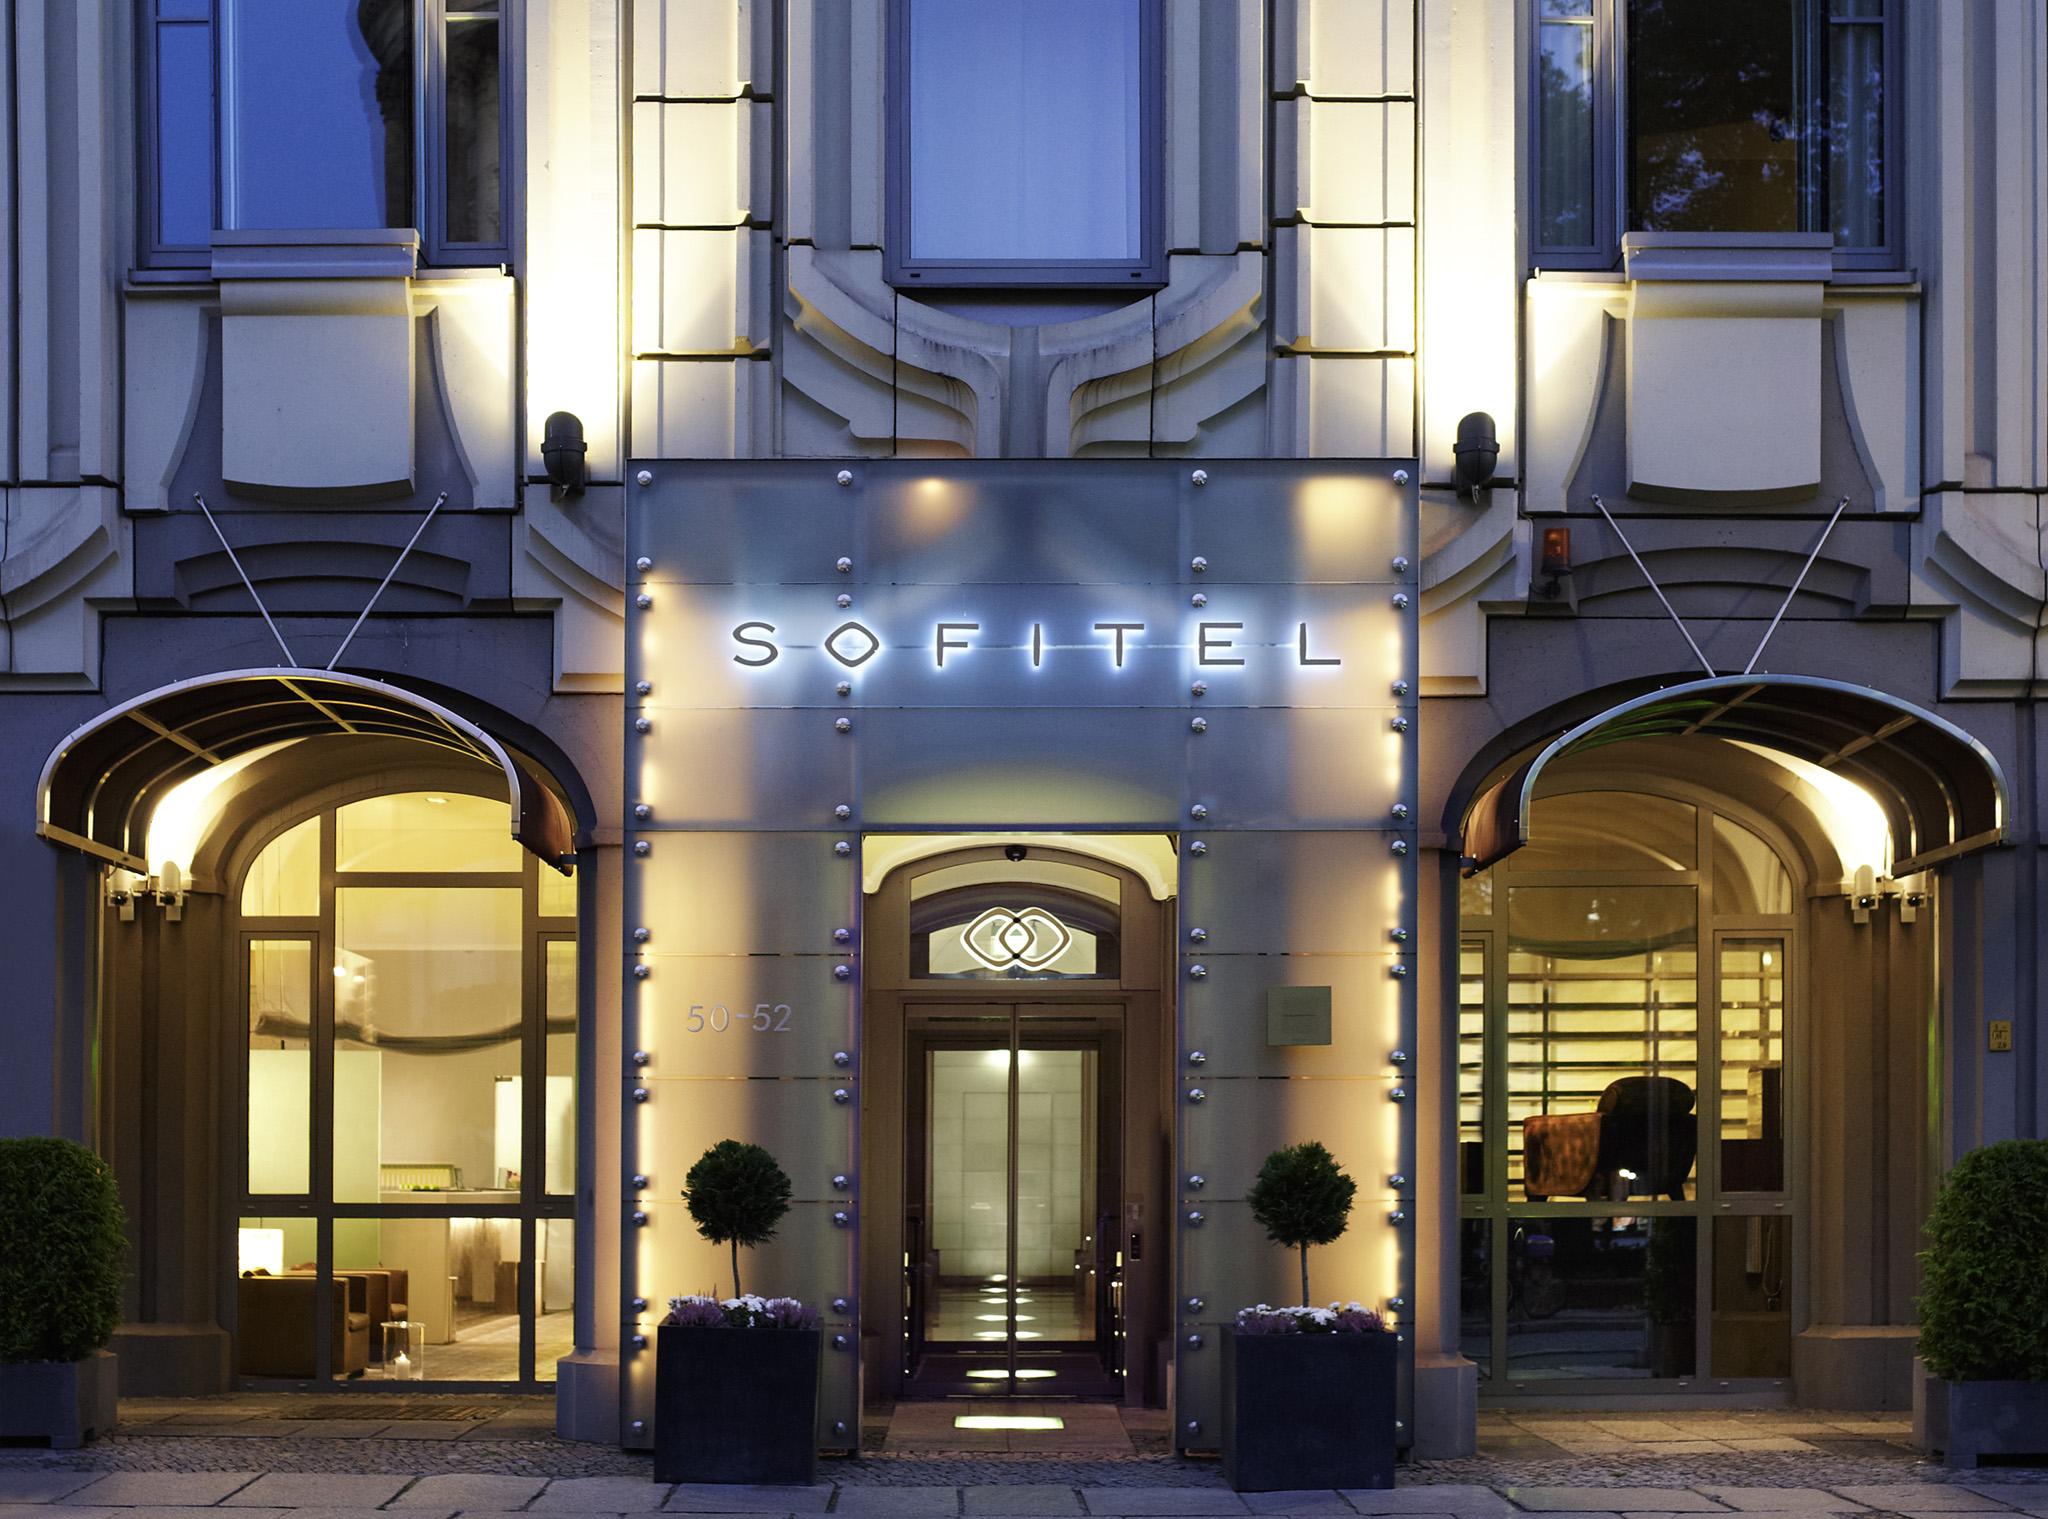 Hotel – Sofitel Berlin Gendarmenmarkt